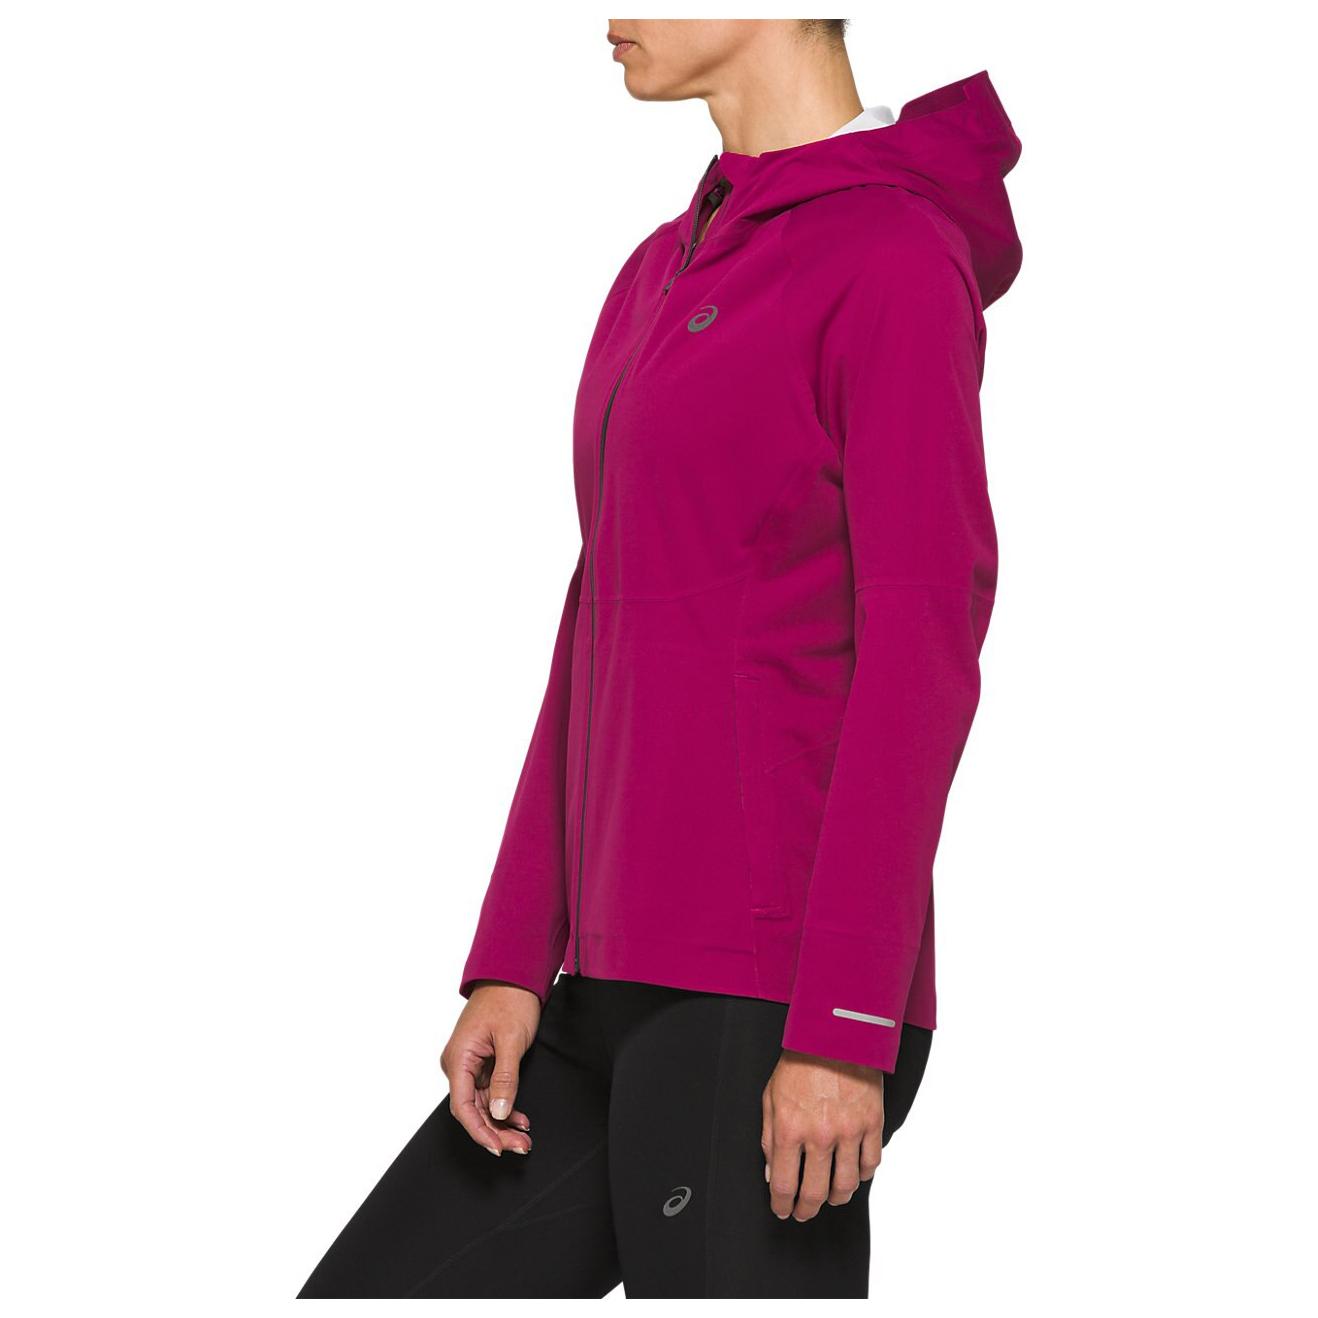 Asics Accelerate Jacket - Running jacket Women's   Buy online ...